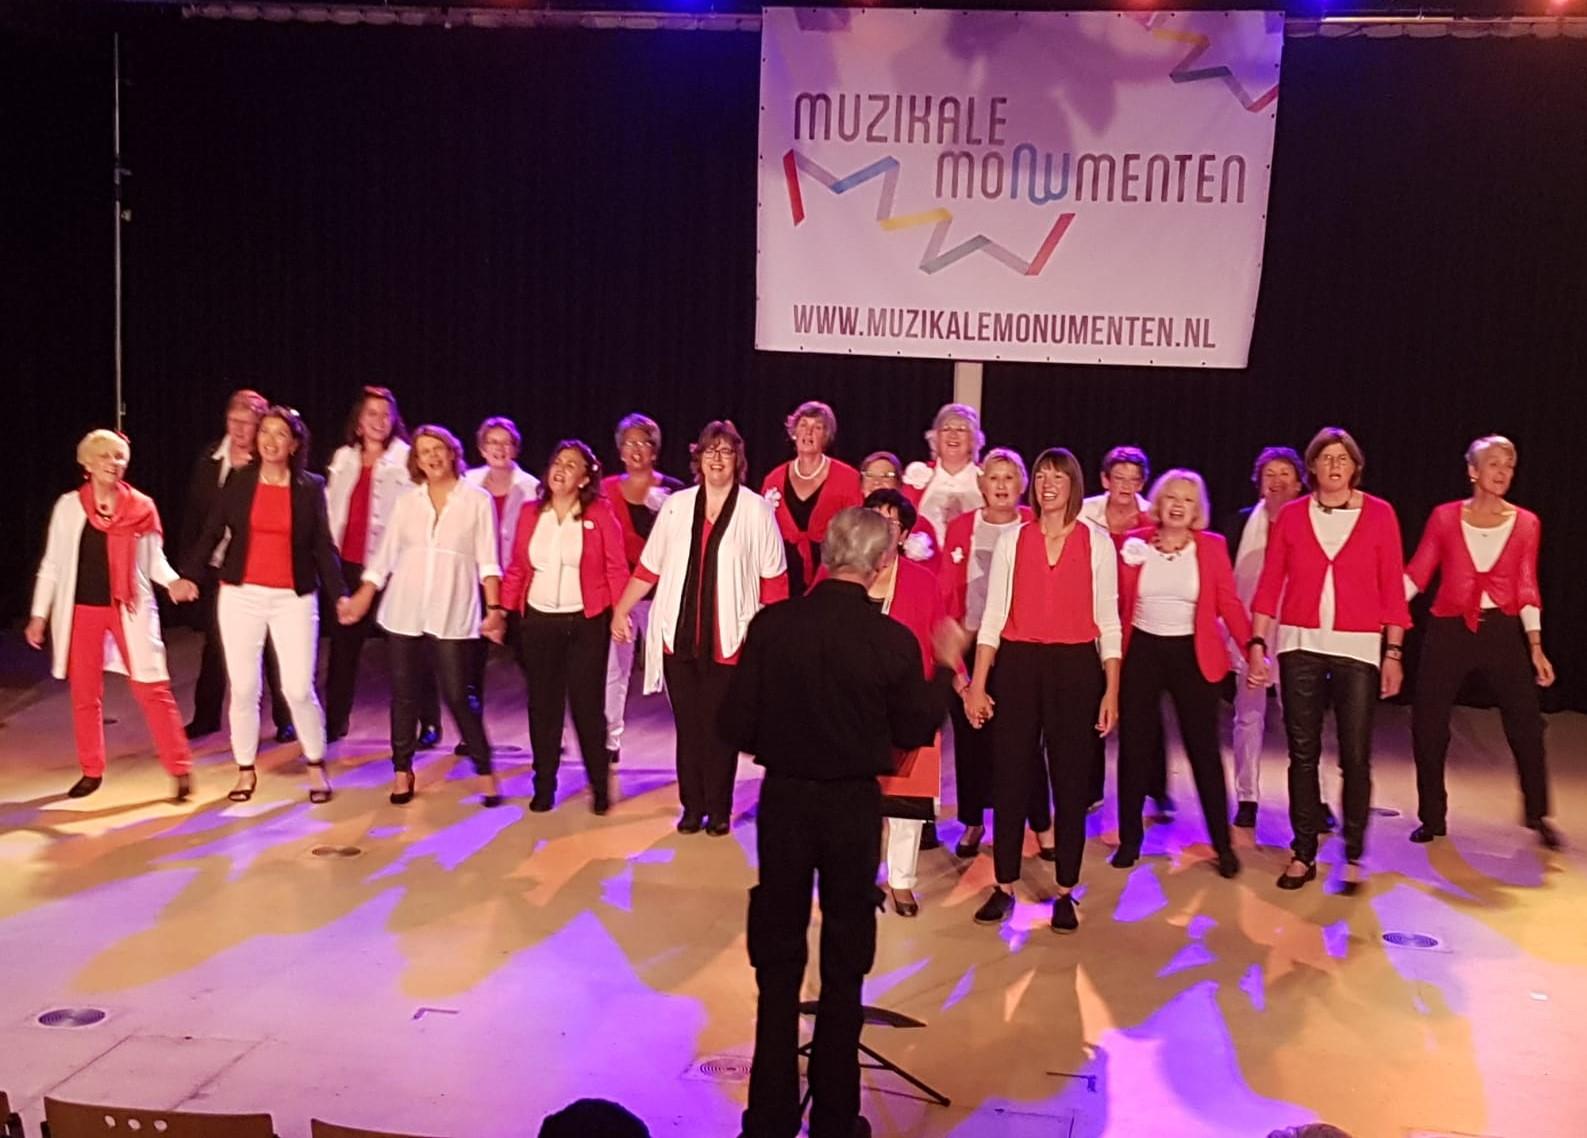 Muzikale Monumenten, De Gelderlandfabriek, Culemborg, 8 september 2019